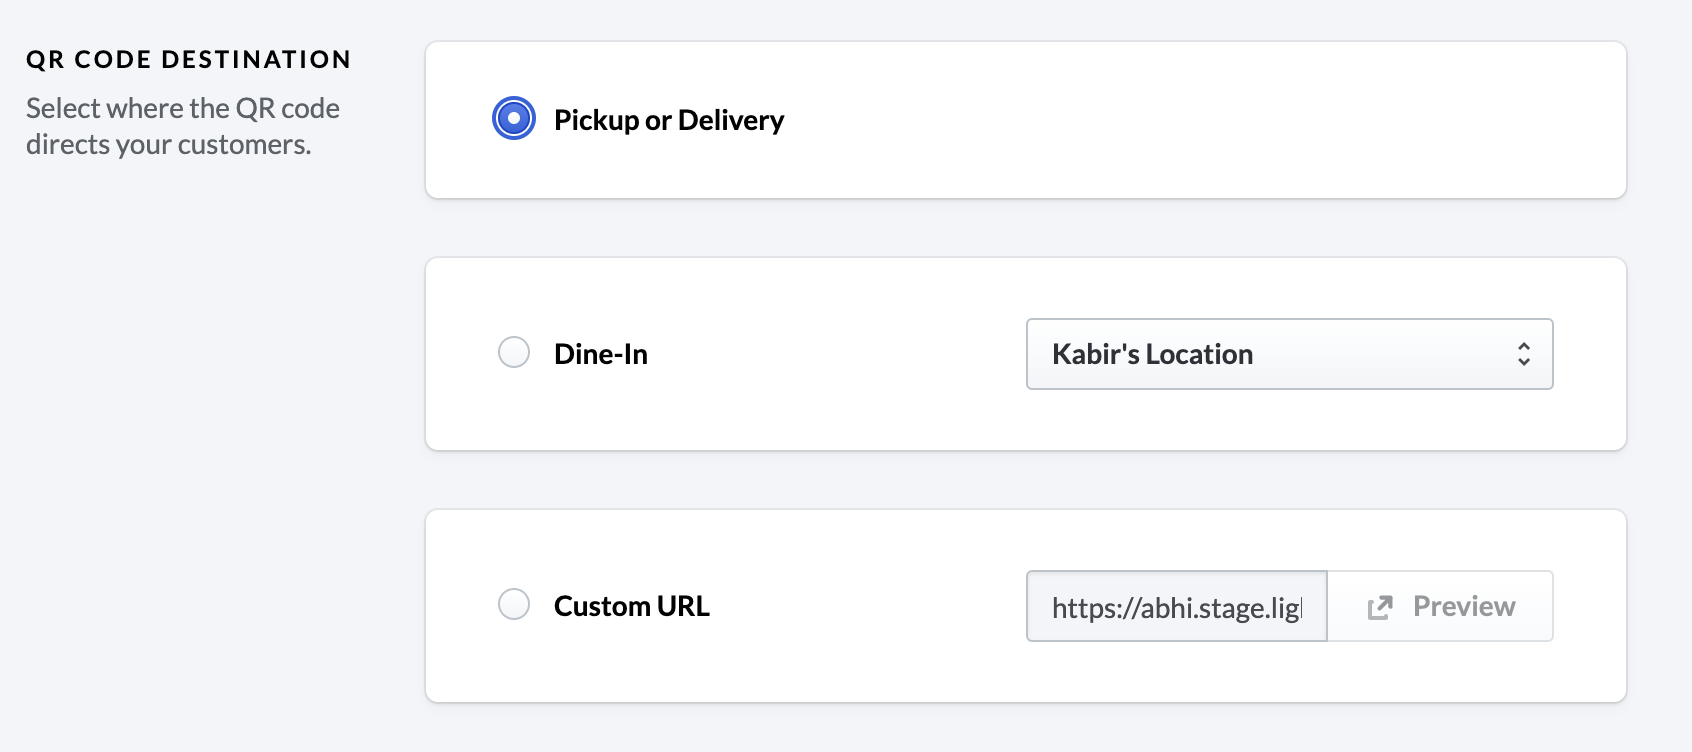 QR_destination_-_Pickup_or_Delivery.png